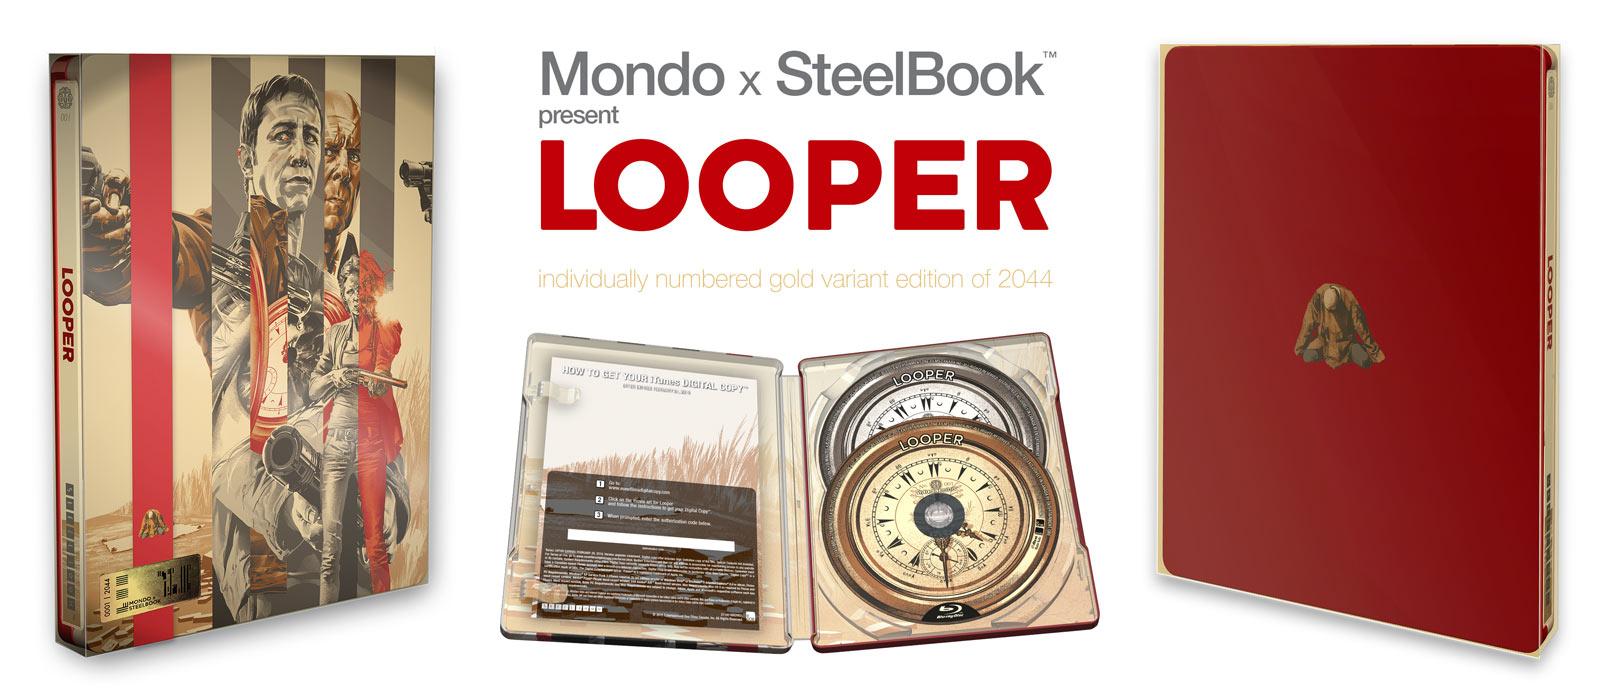 looper-mondo-x-steelbook-variant